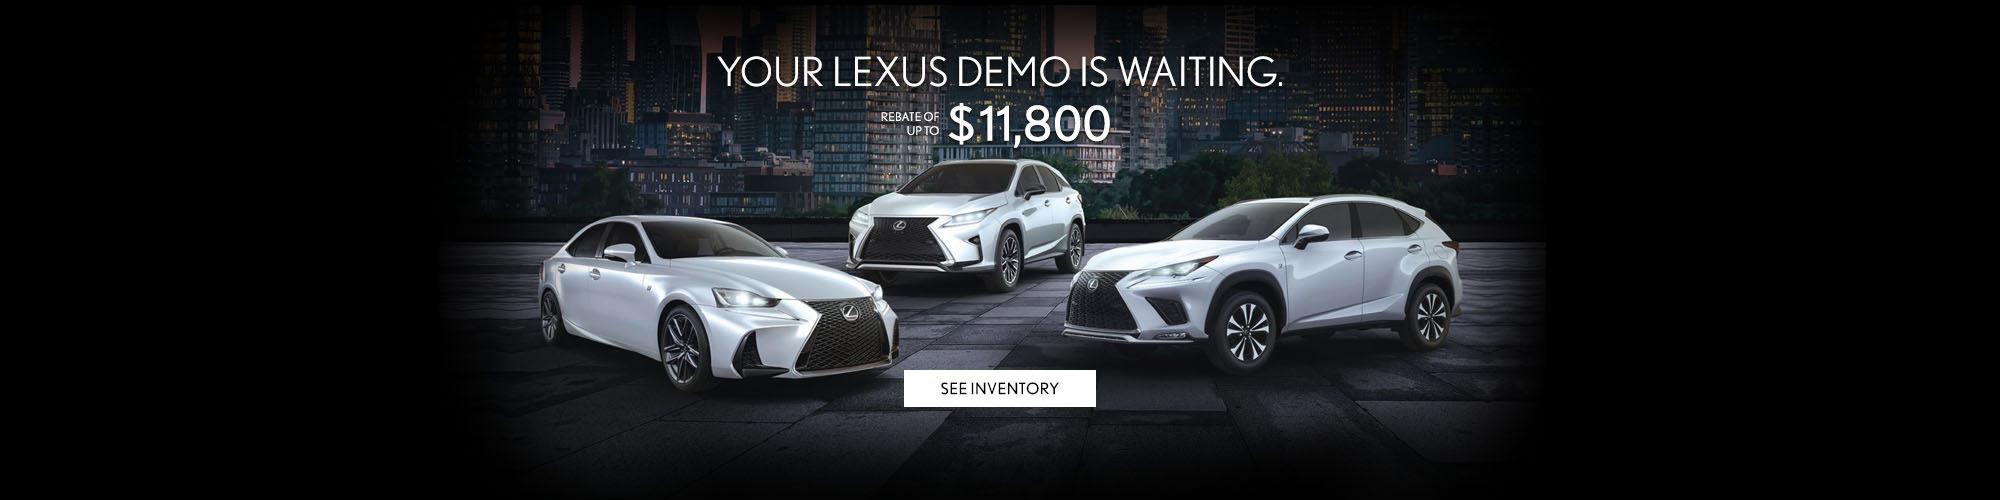 Lexus Dealership In Montreal Near Laval Spinelli Lexus Lachine